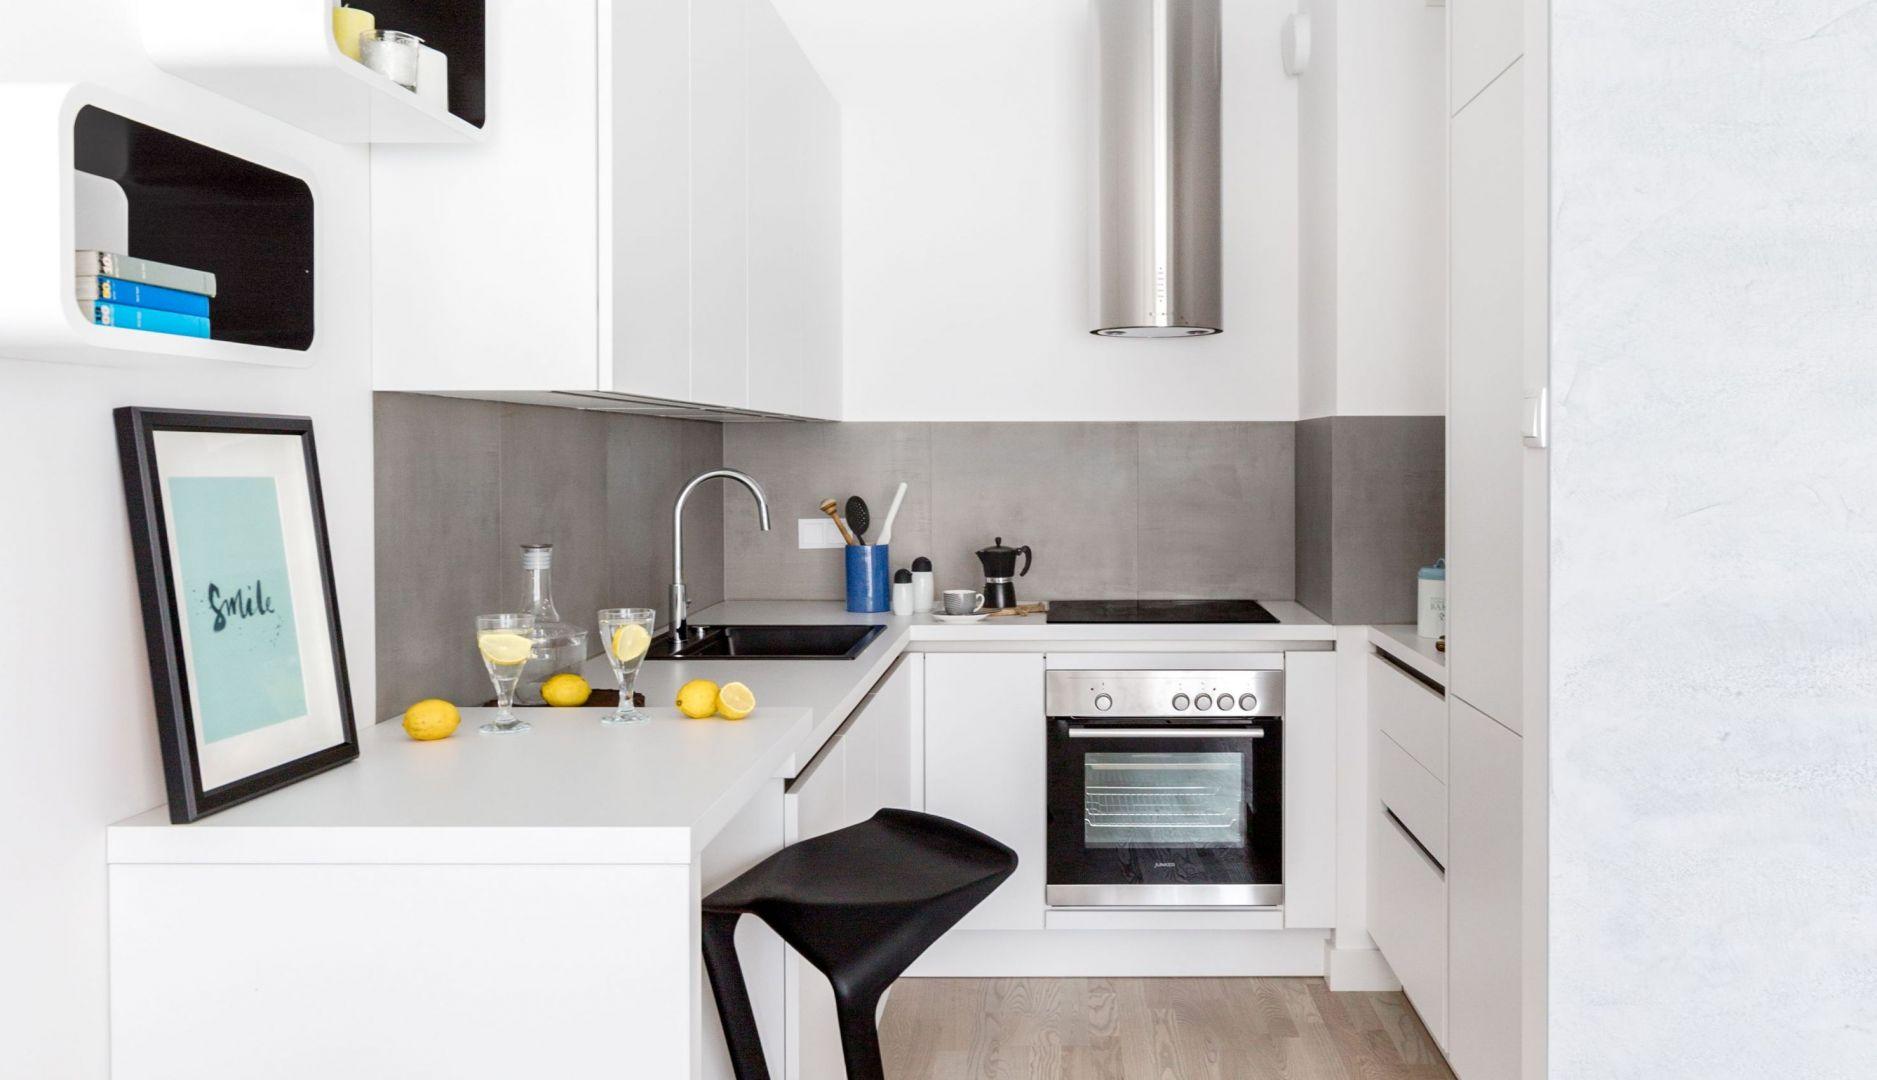 Biała kuchnia w bloku. Projekt Decoroom. Fot. Pion Poziom